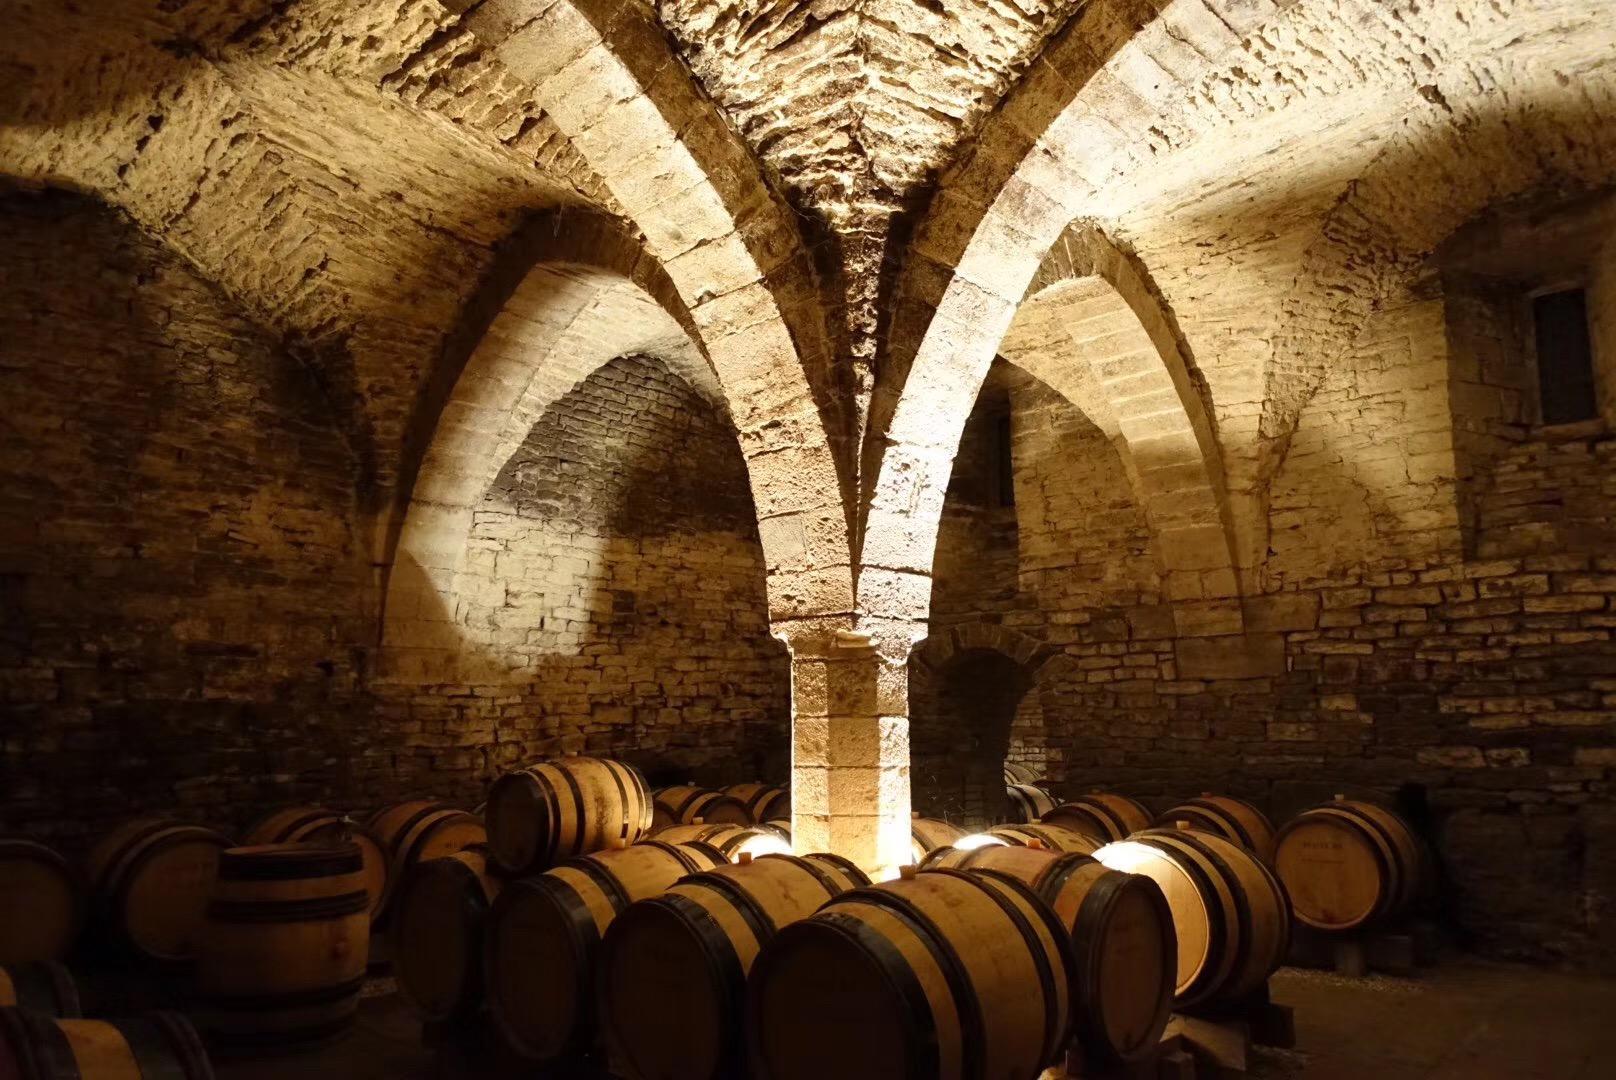 Dugat-Py酒庄11-12世纪由天主教修士修建的古老修道院酒窖,摄影:知味葡萄酒杂志主编朱思维